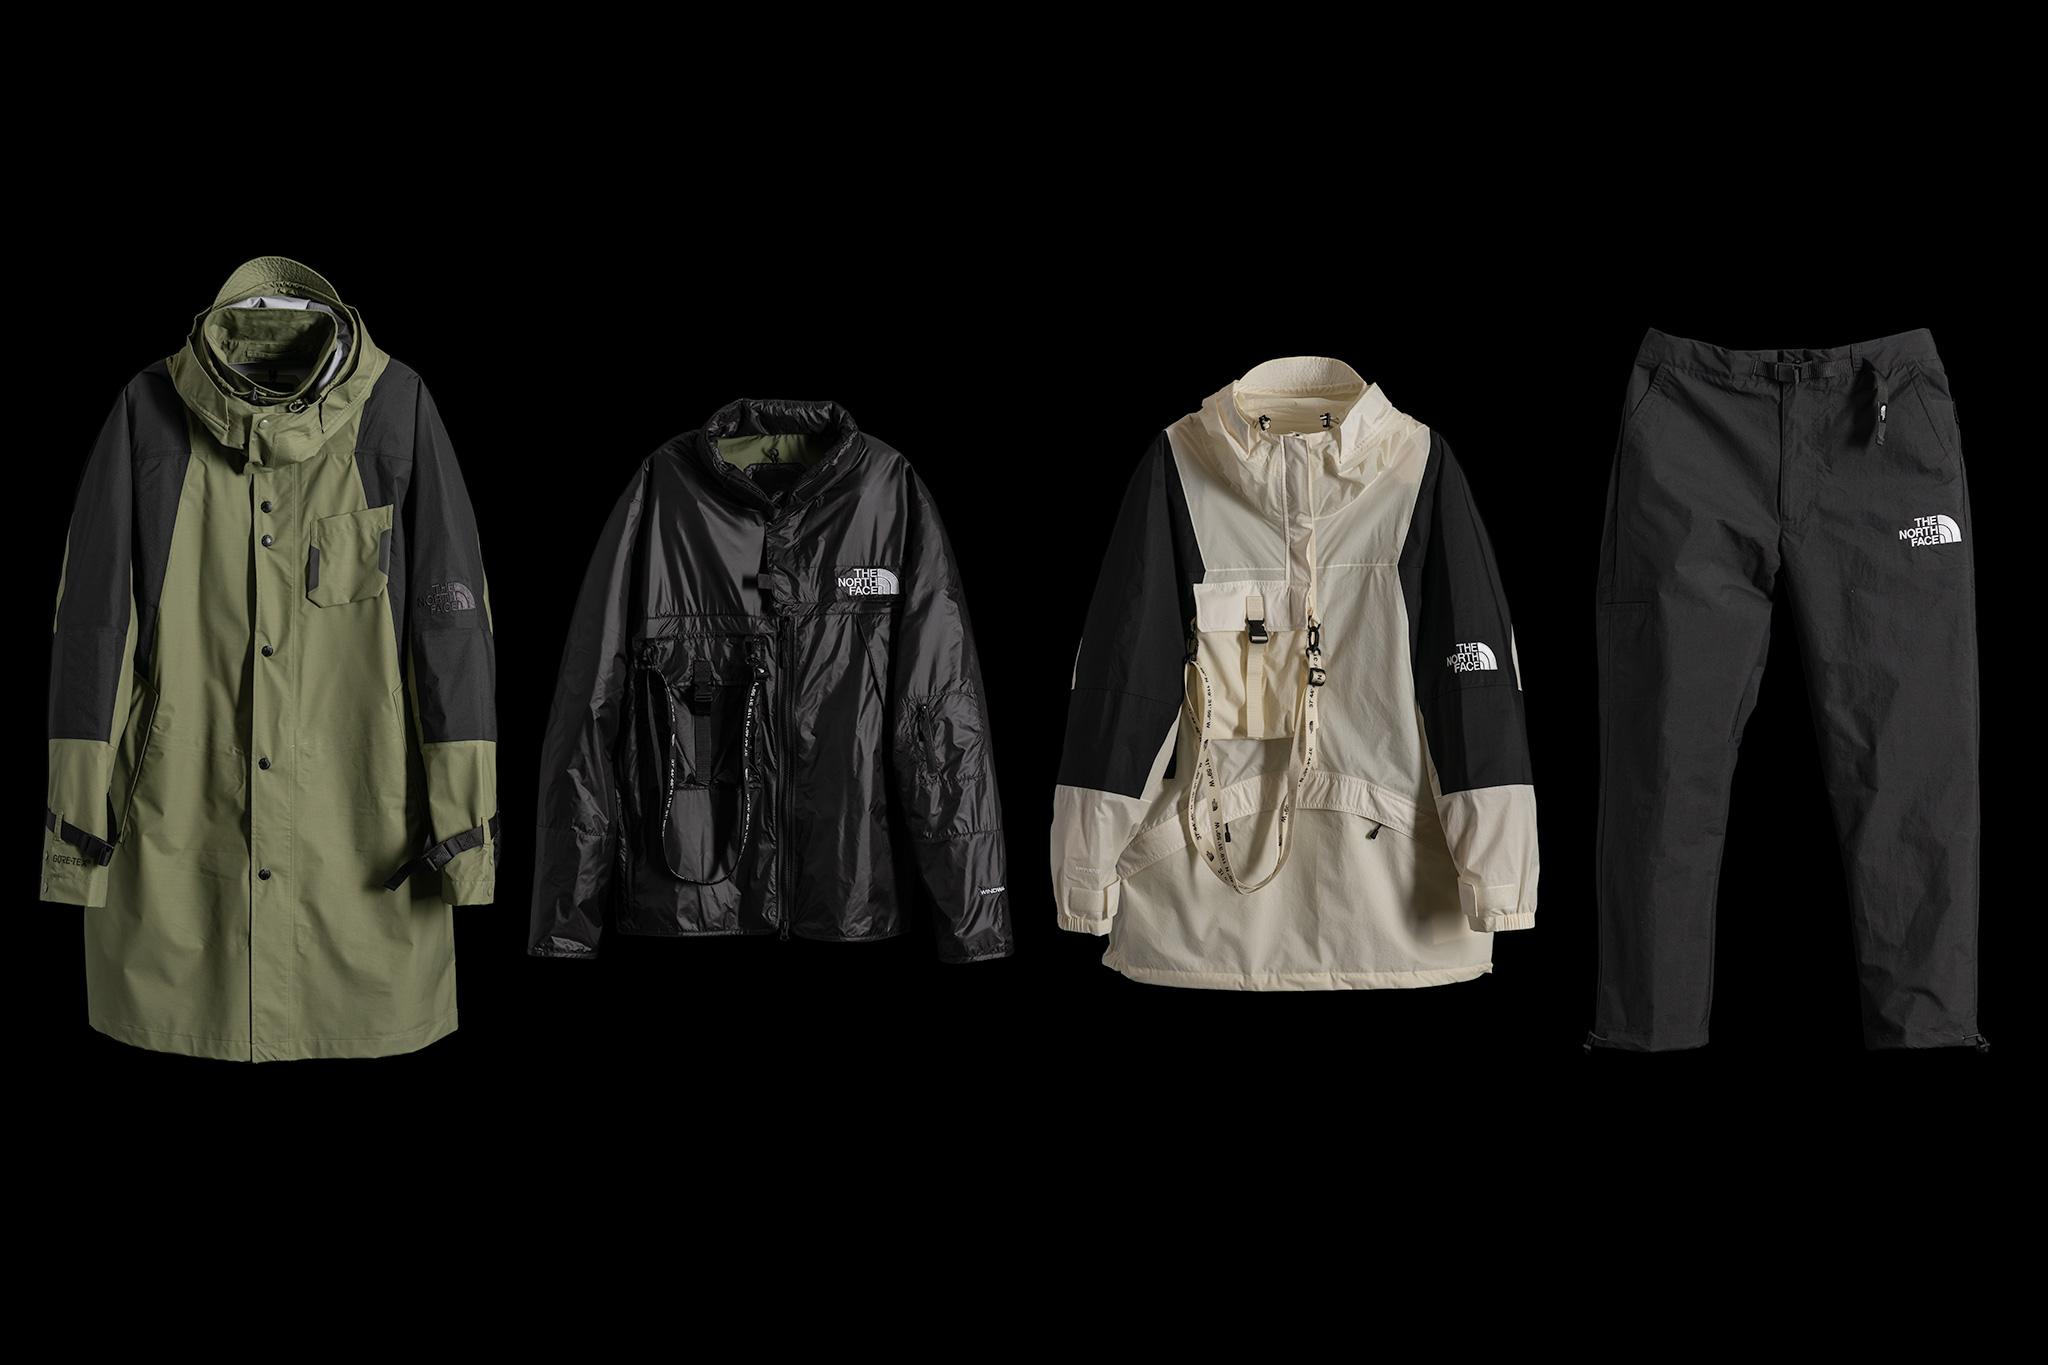 HAVEN-The-North-Face-Black-Series-x-Kazuki-Kuraishi-SS19-March-Release-WEB.jpg